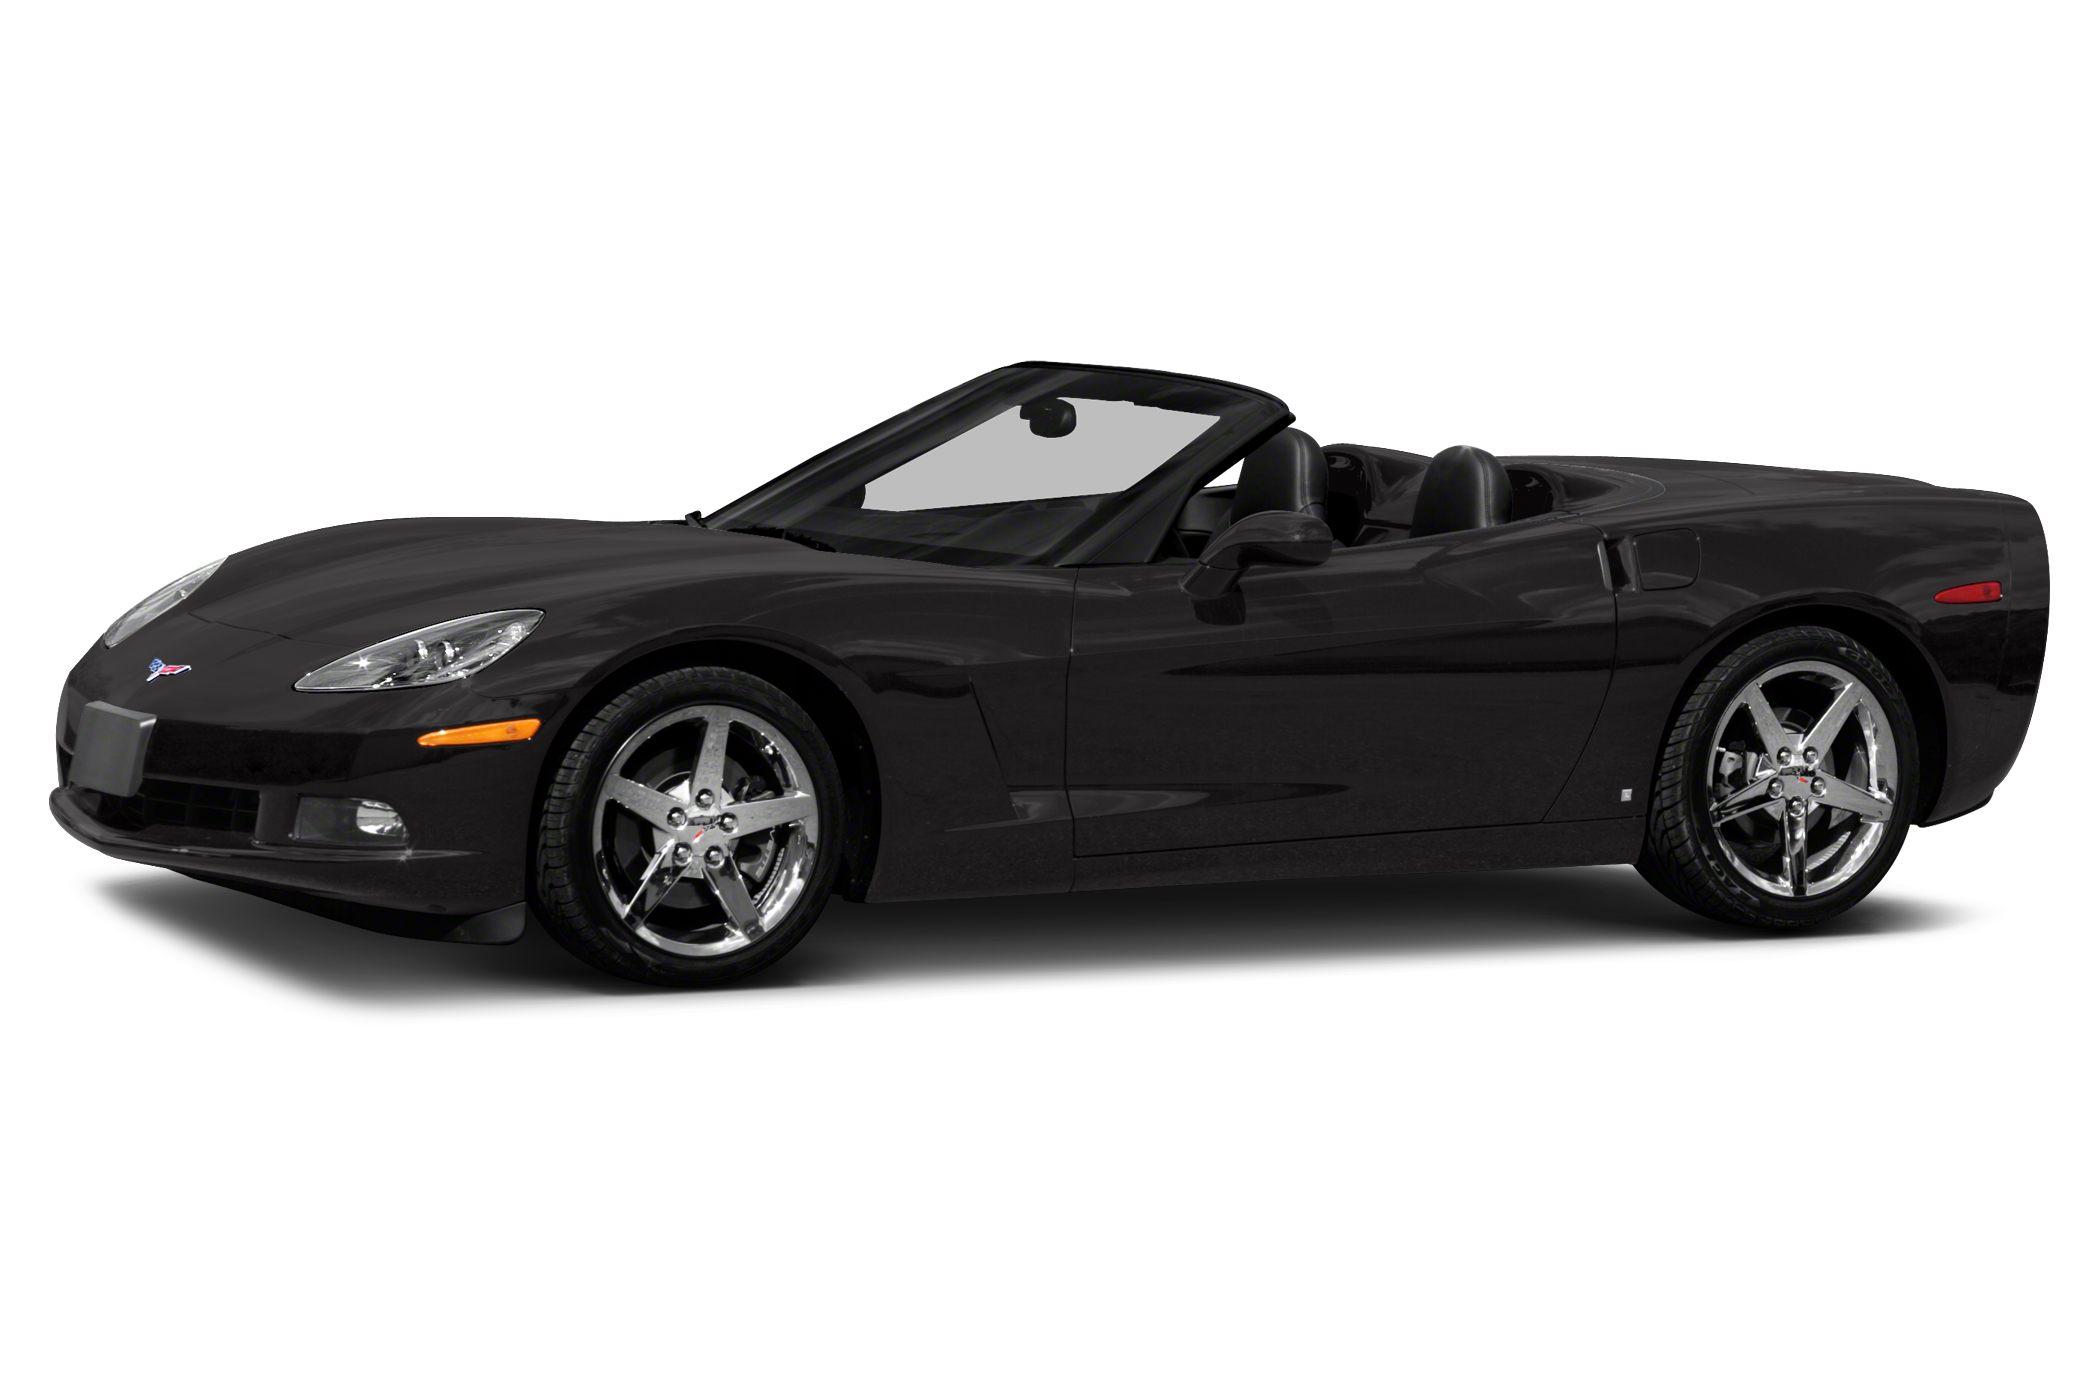 2017 Chevrolet Corvette Pricing And Specs